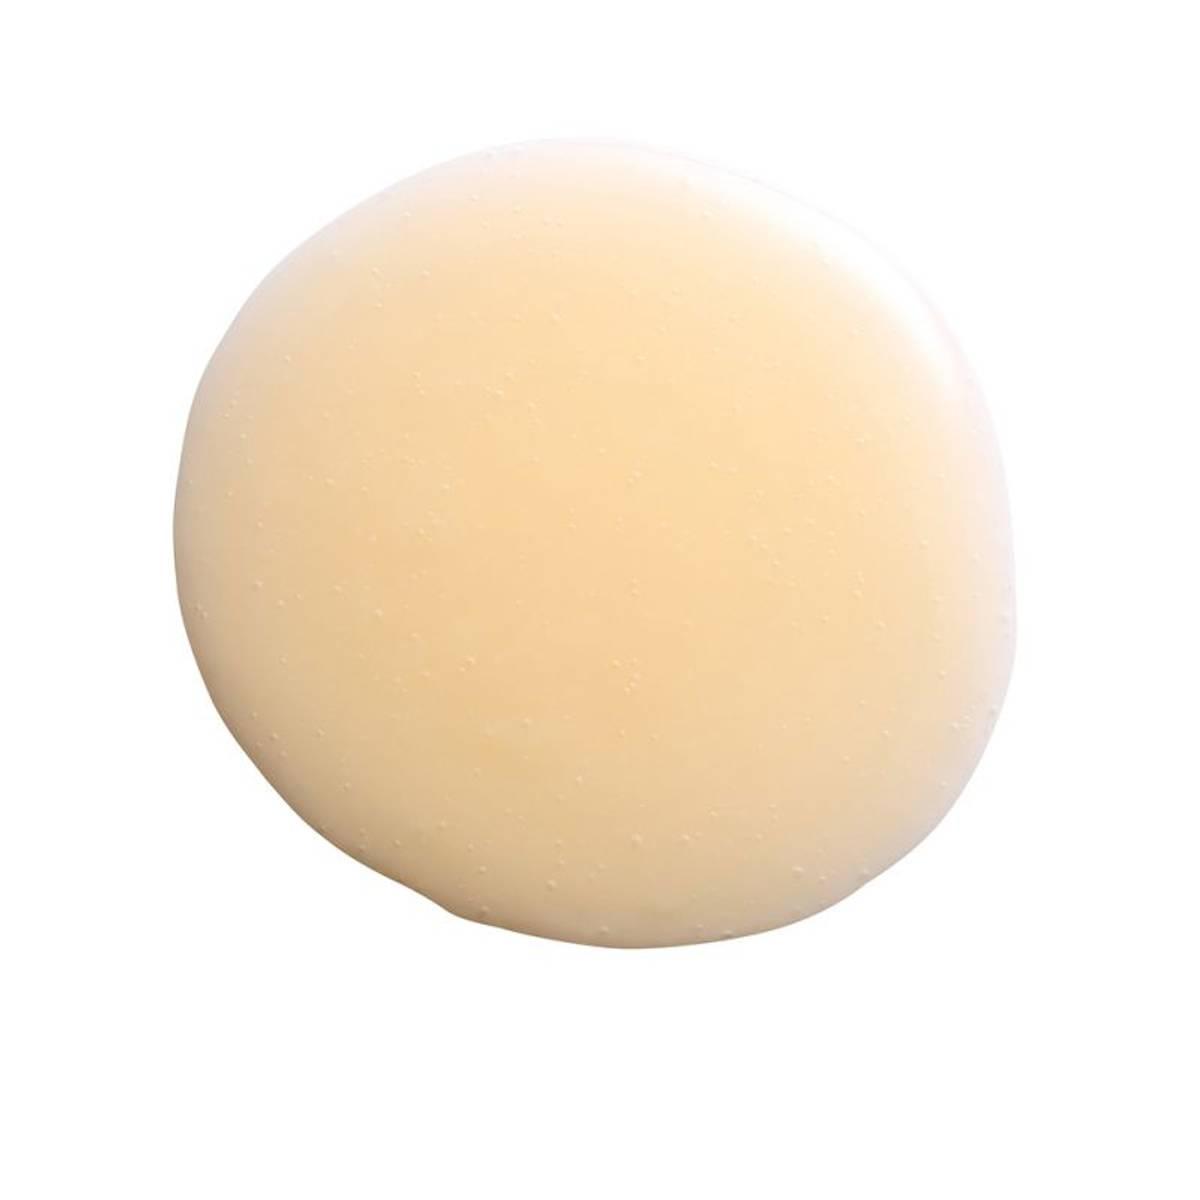 Ansiktsrens 150ml, BioVedic™ Enzyme Face Wash / Fushi